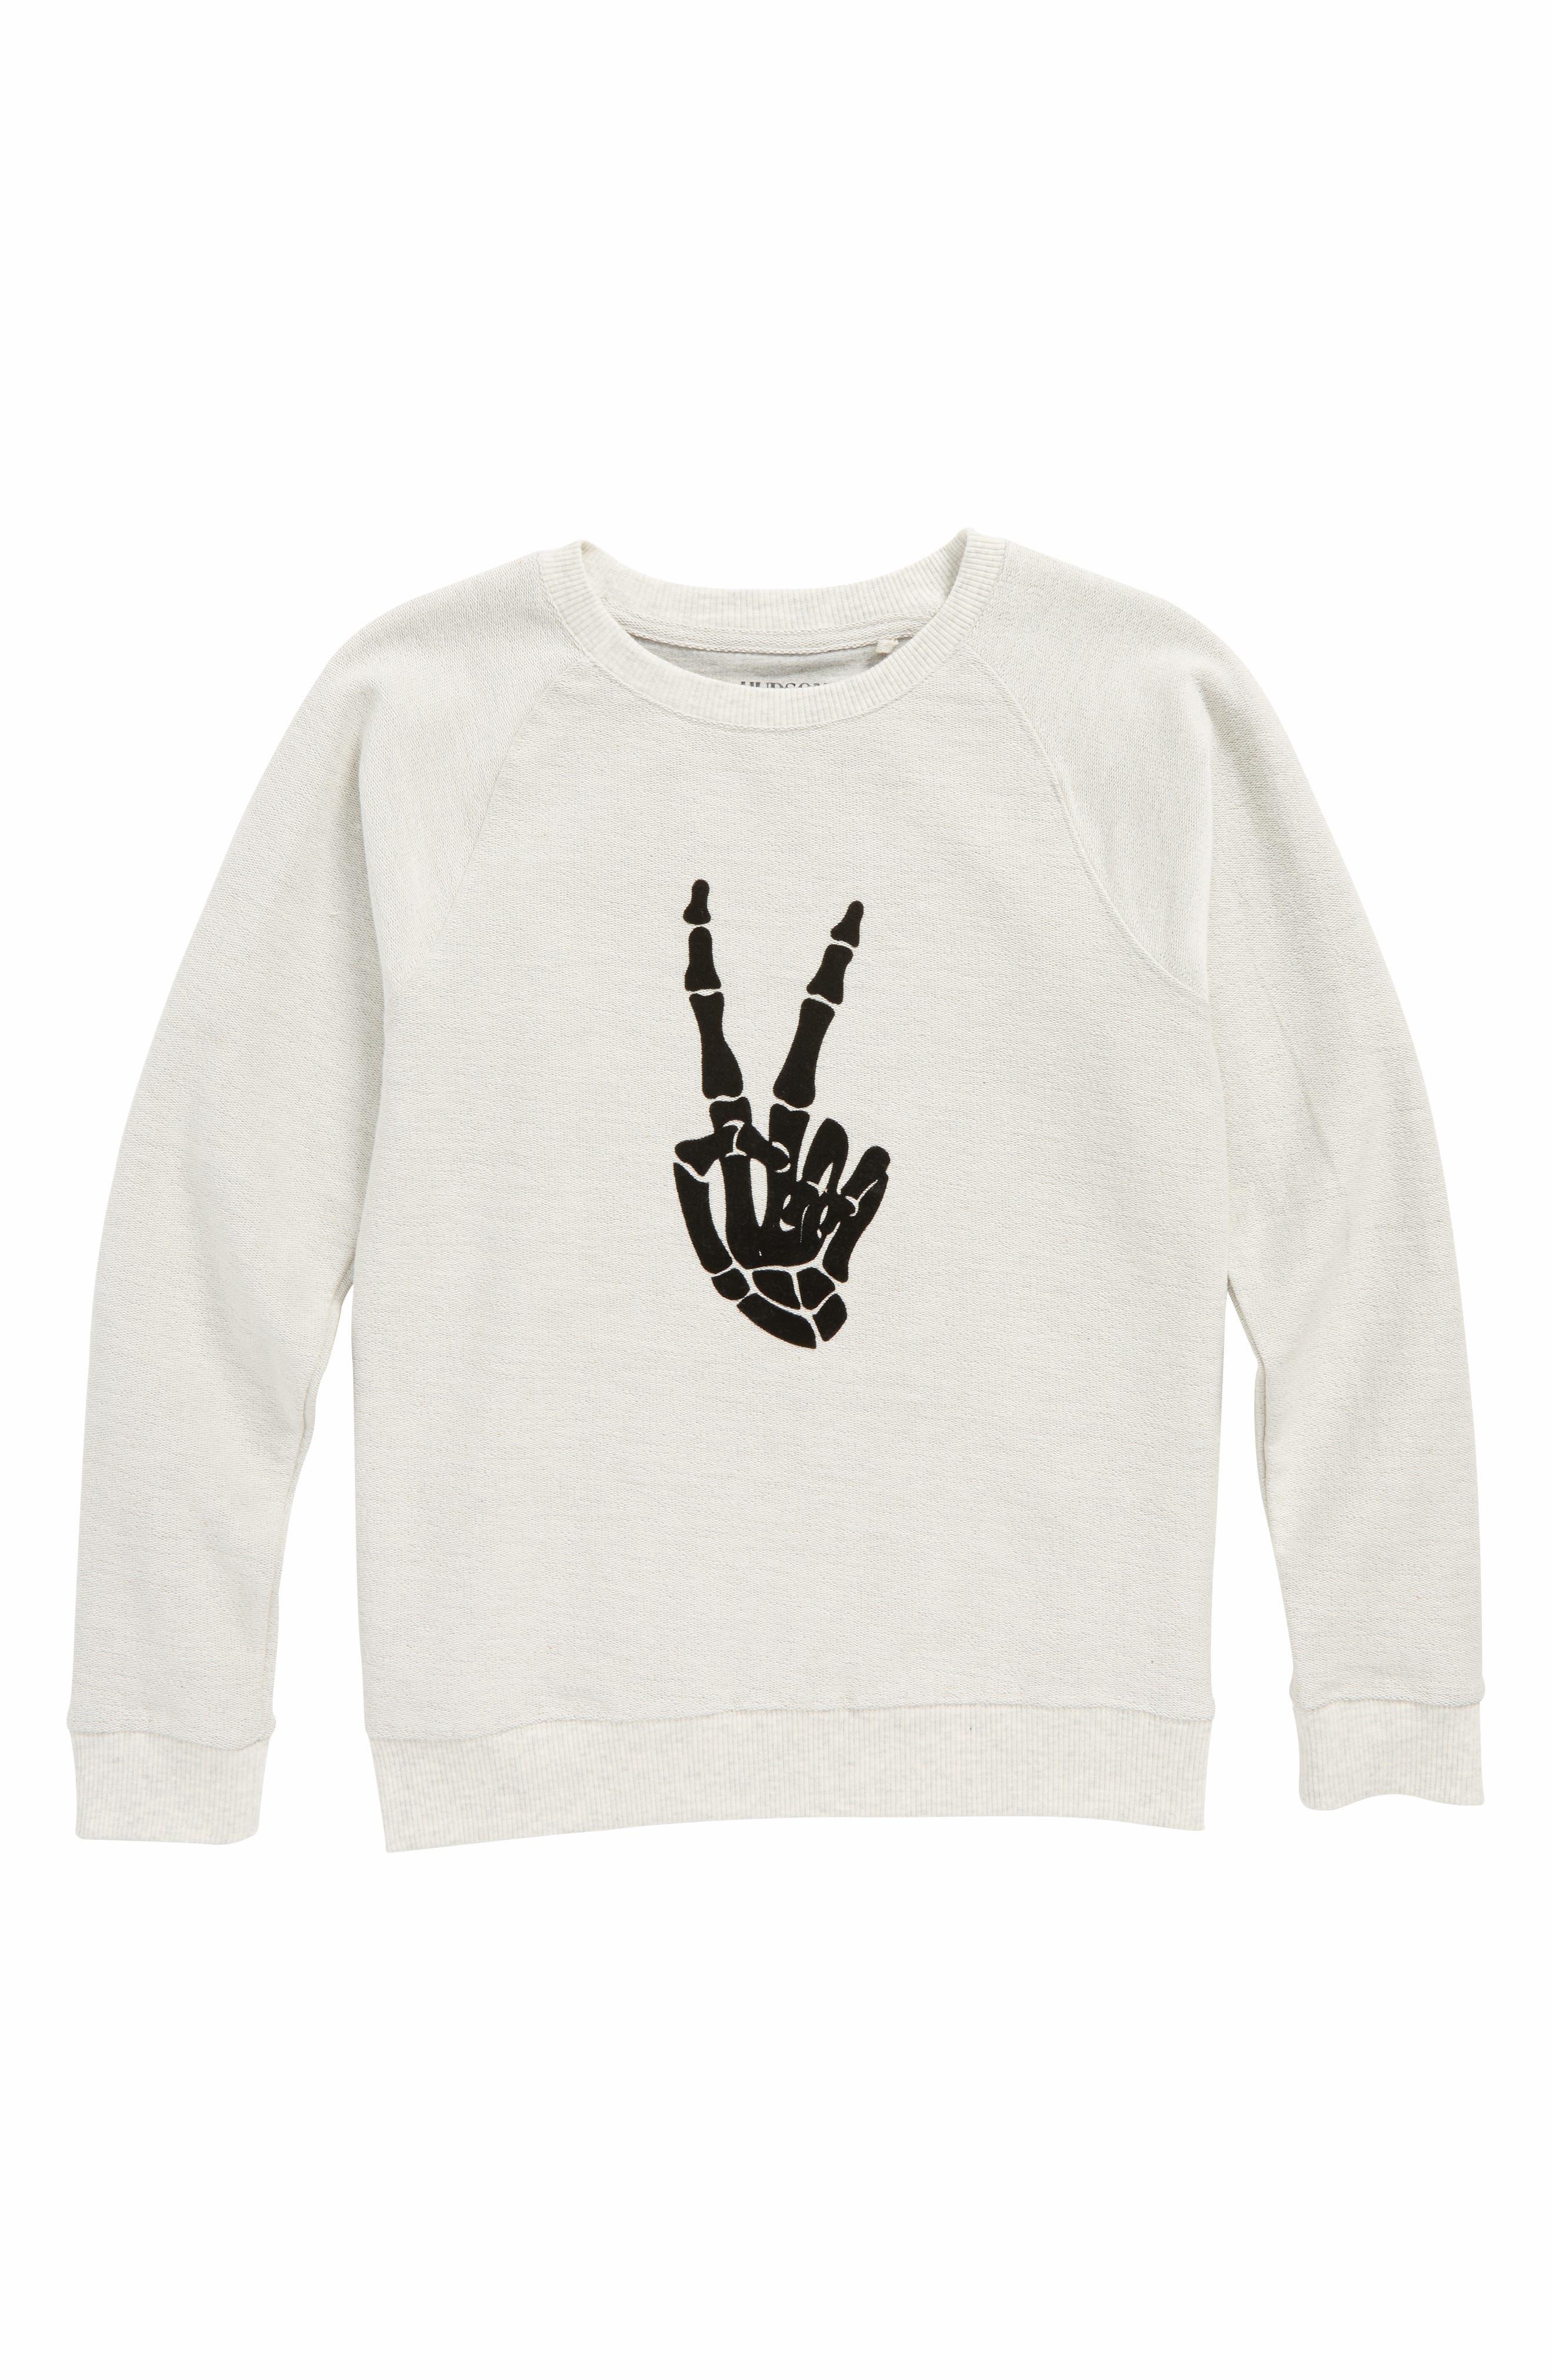 Vibes Graphic Sweatshirt,                             Main thumbnail 1, color,                             020